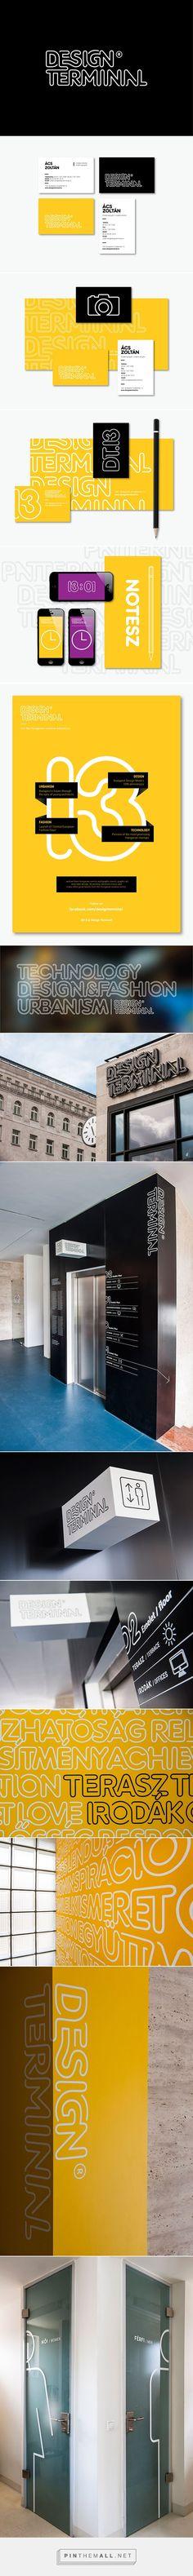 Design Terminal Branding on Behance